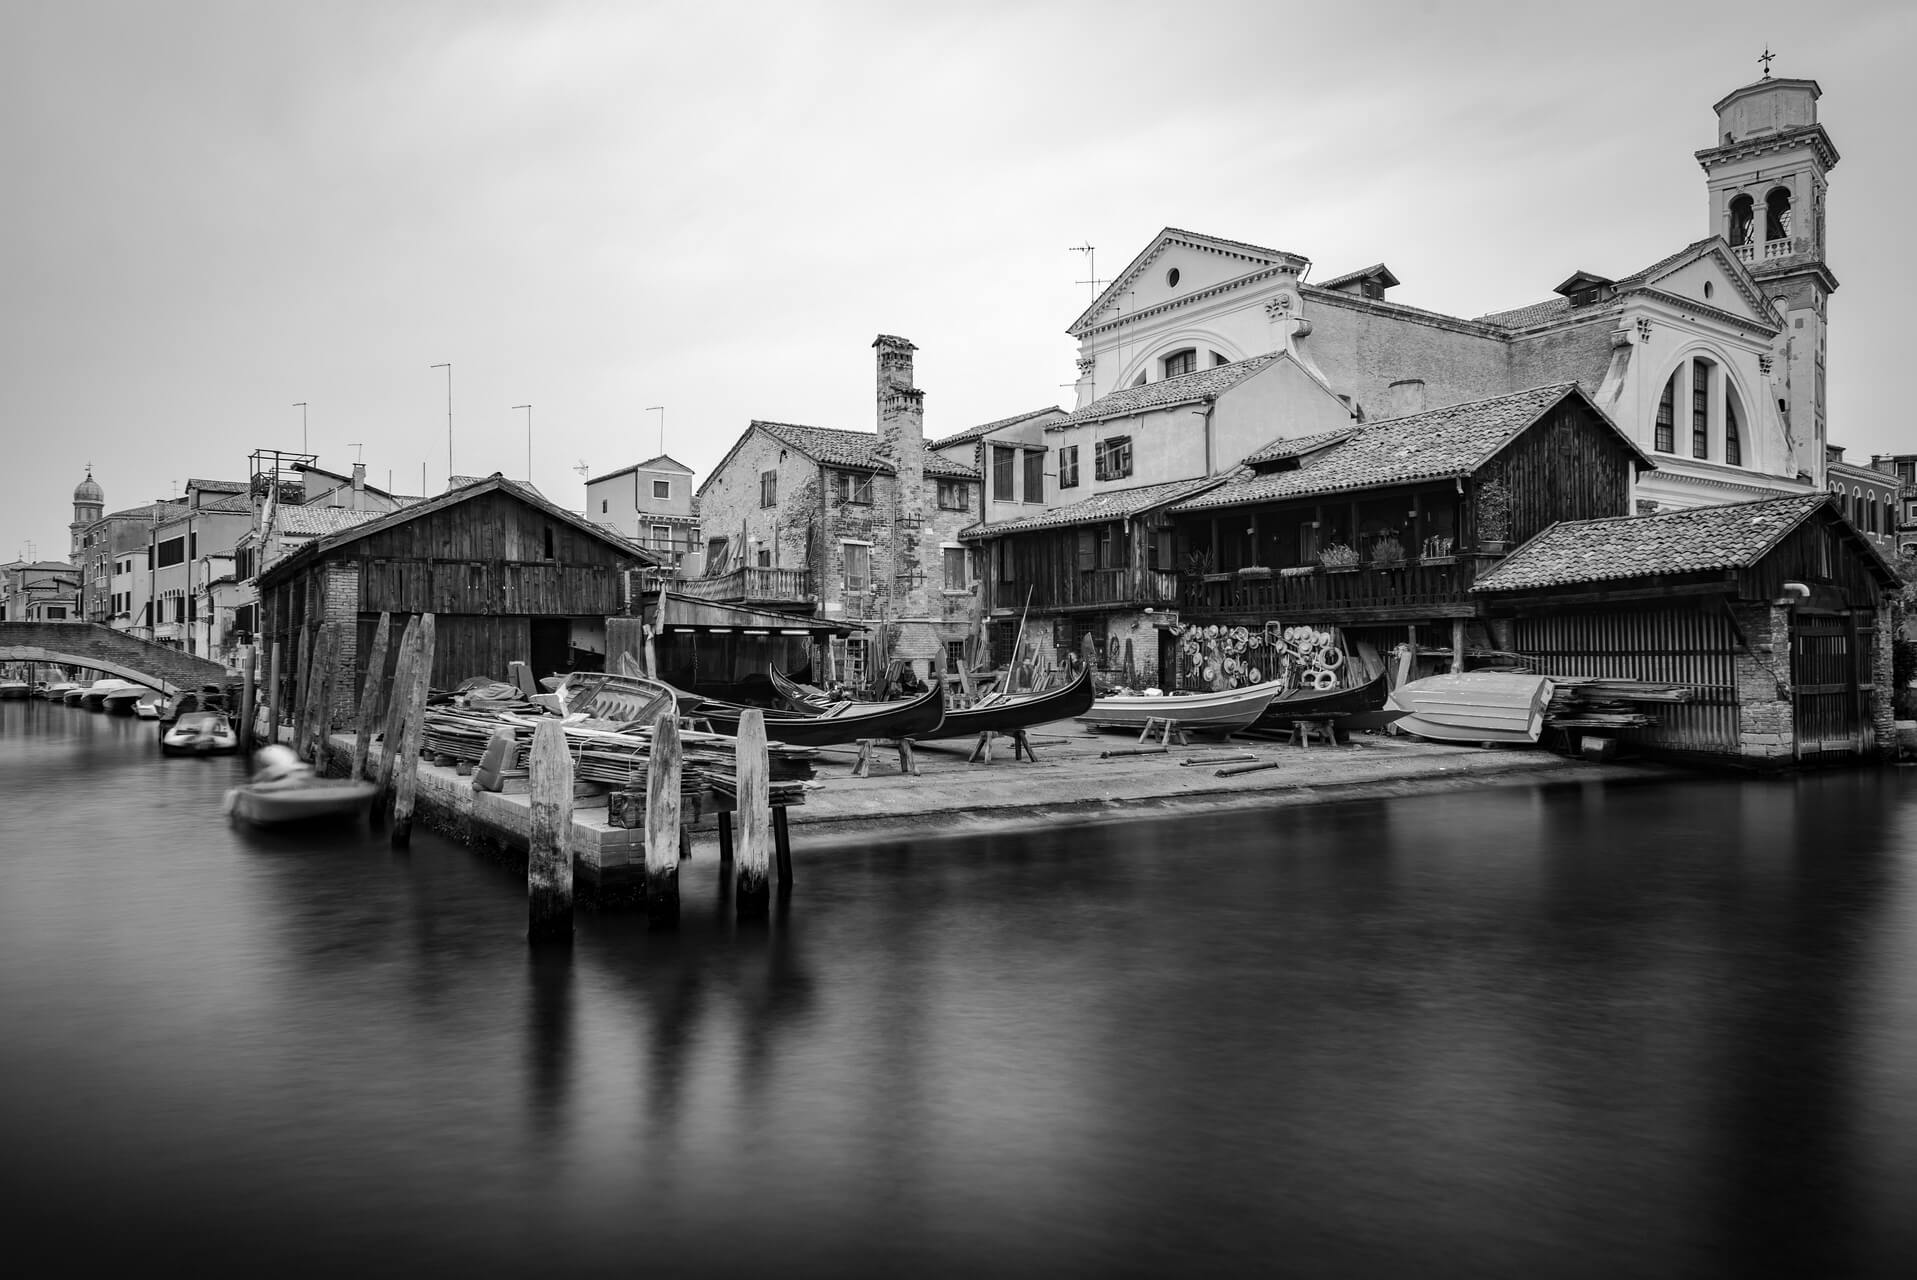 Venice Gondola dockyard, Fotograf: Steffen Lohse